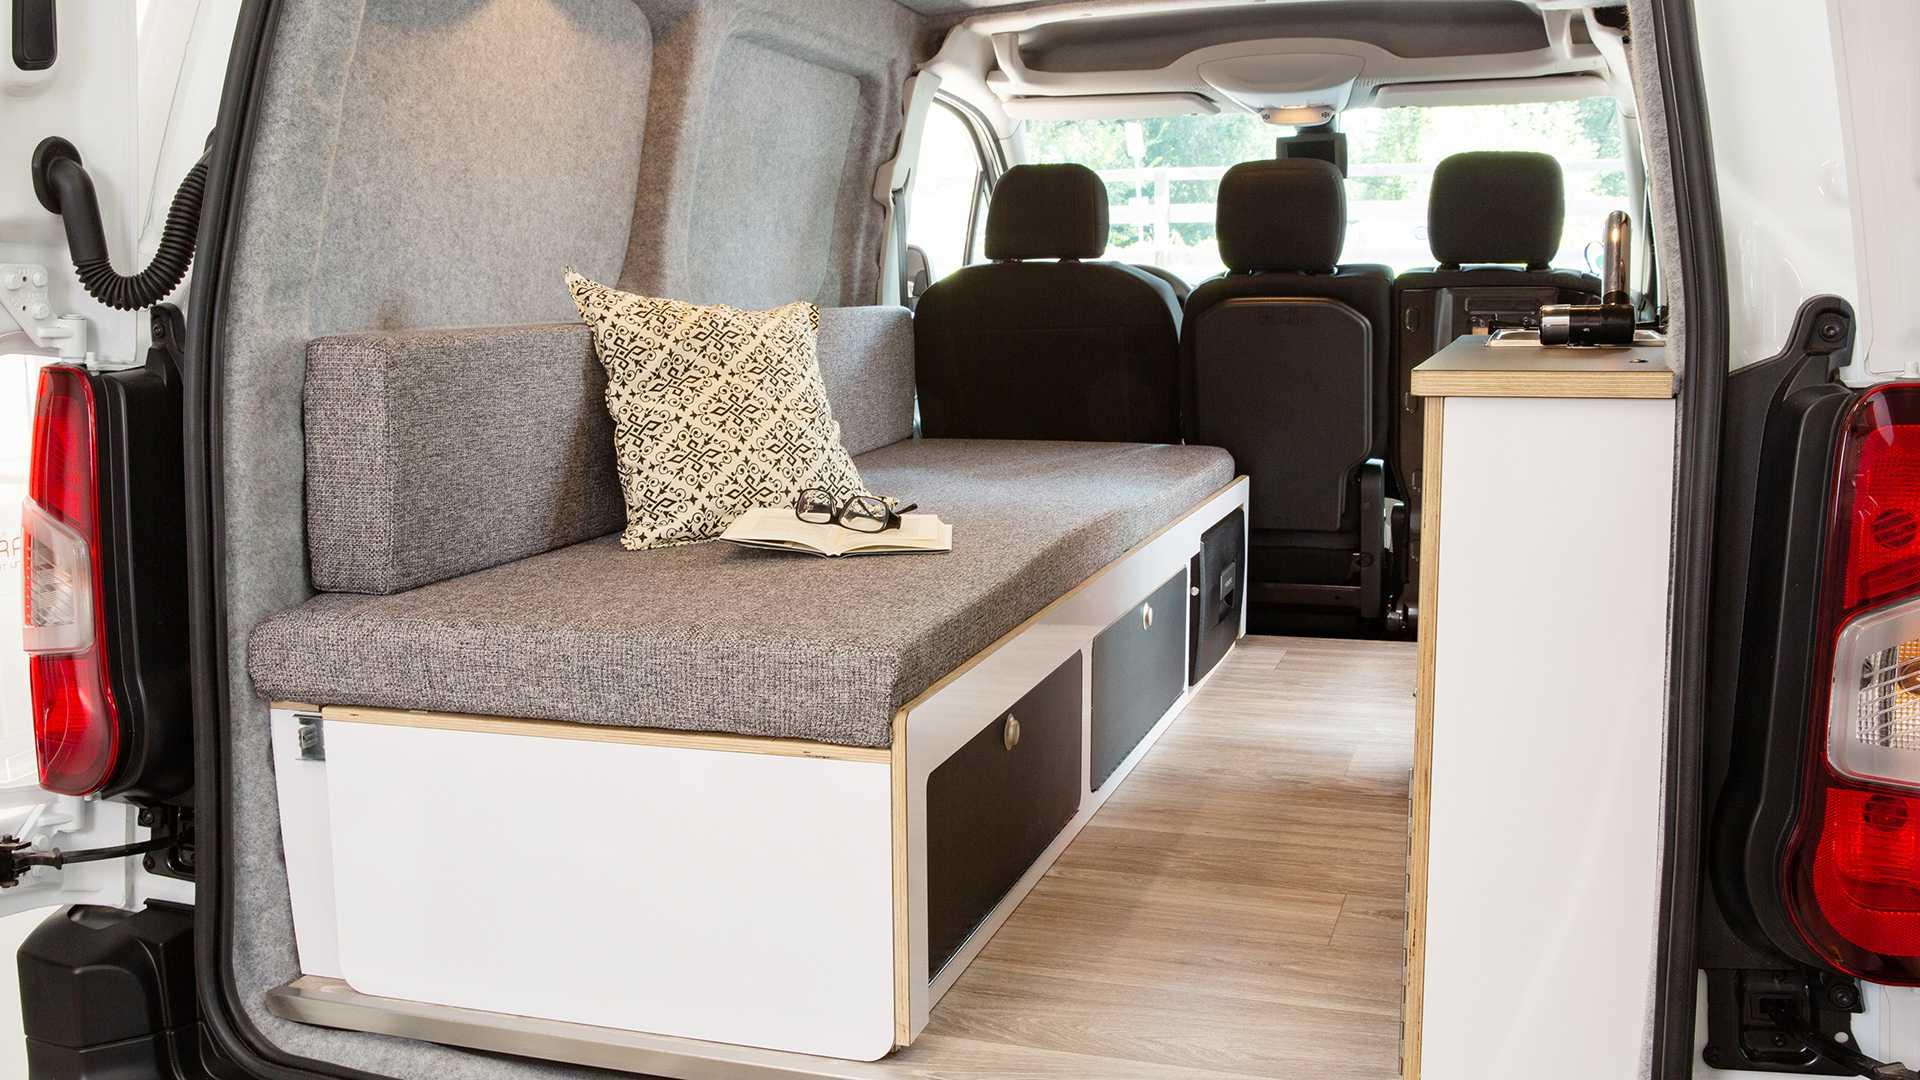 Peugeot Partner Alpin Camper To Debut At Caravan Salon 2019 Autoevolution